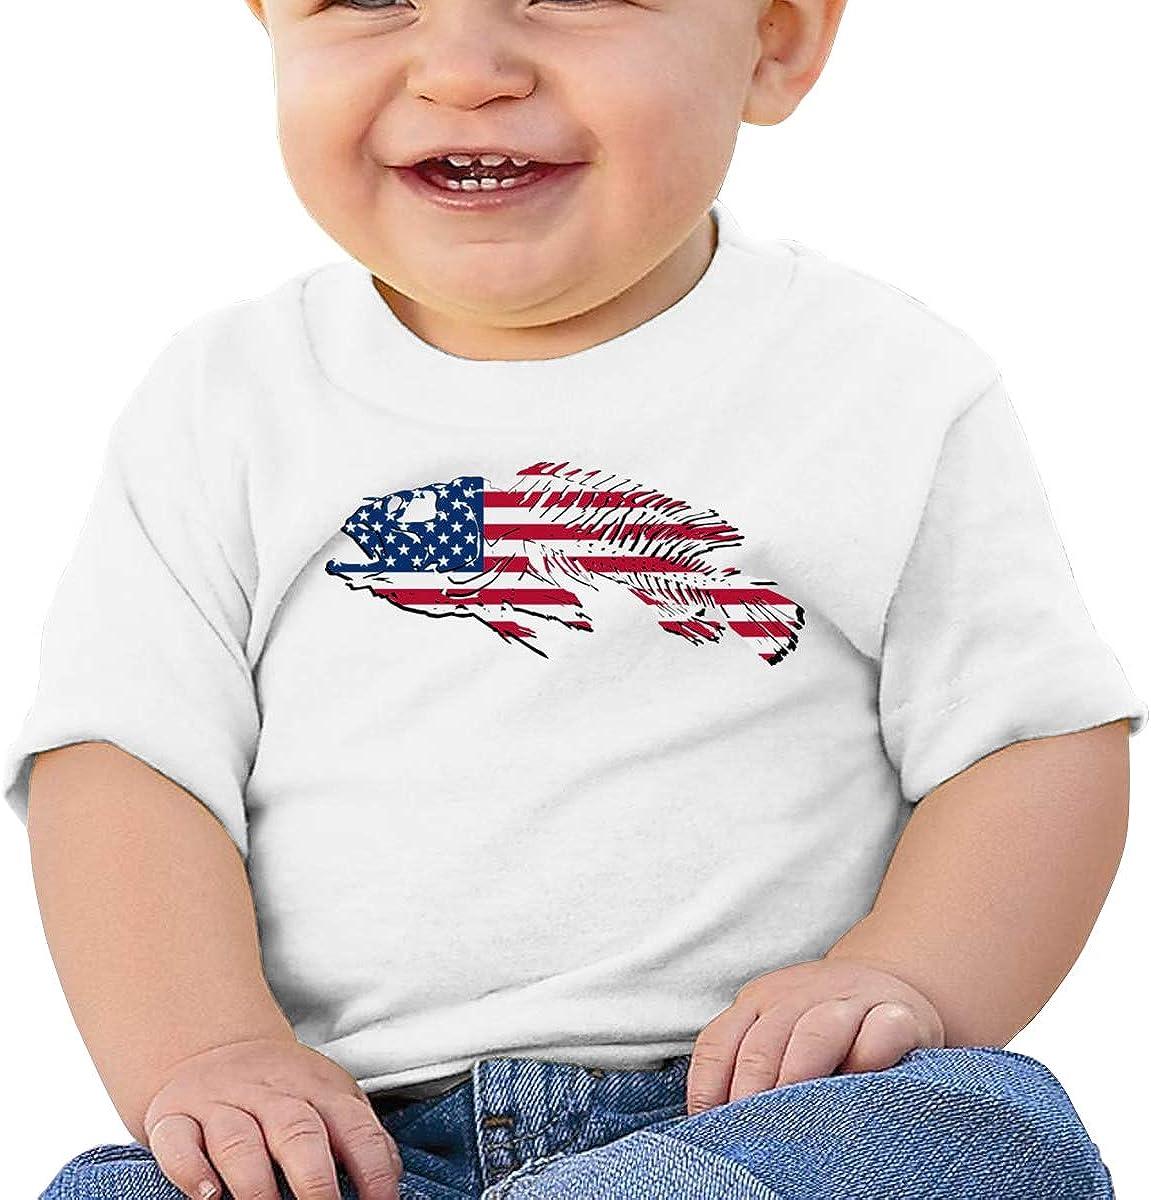 FOECBIR Tacosaurus Taco Dinosaur Child 100/% Cotton Short Sleeve T-Shirts for Baby Girls